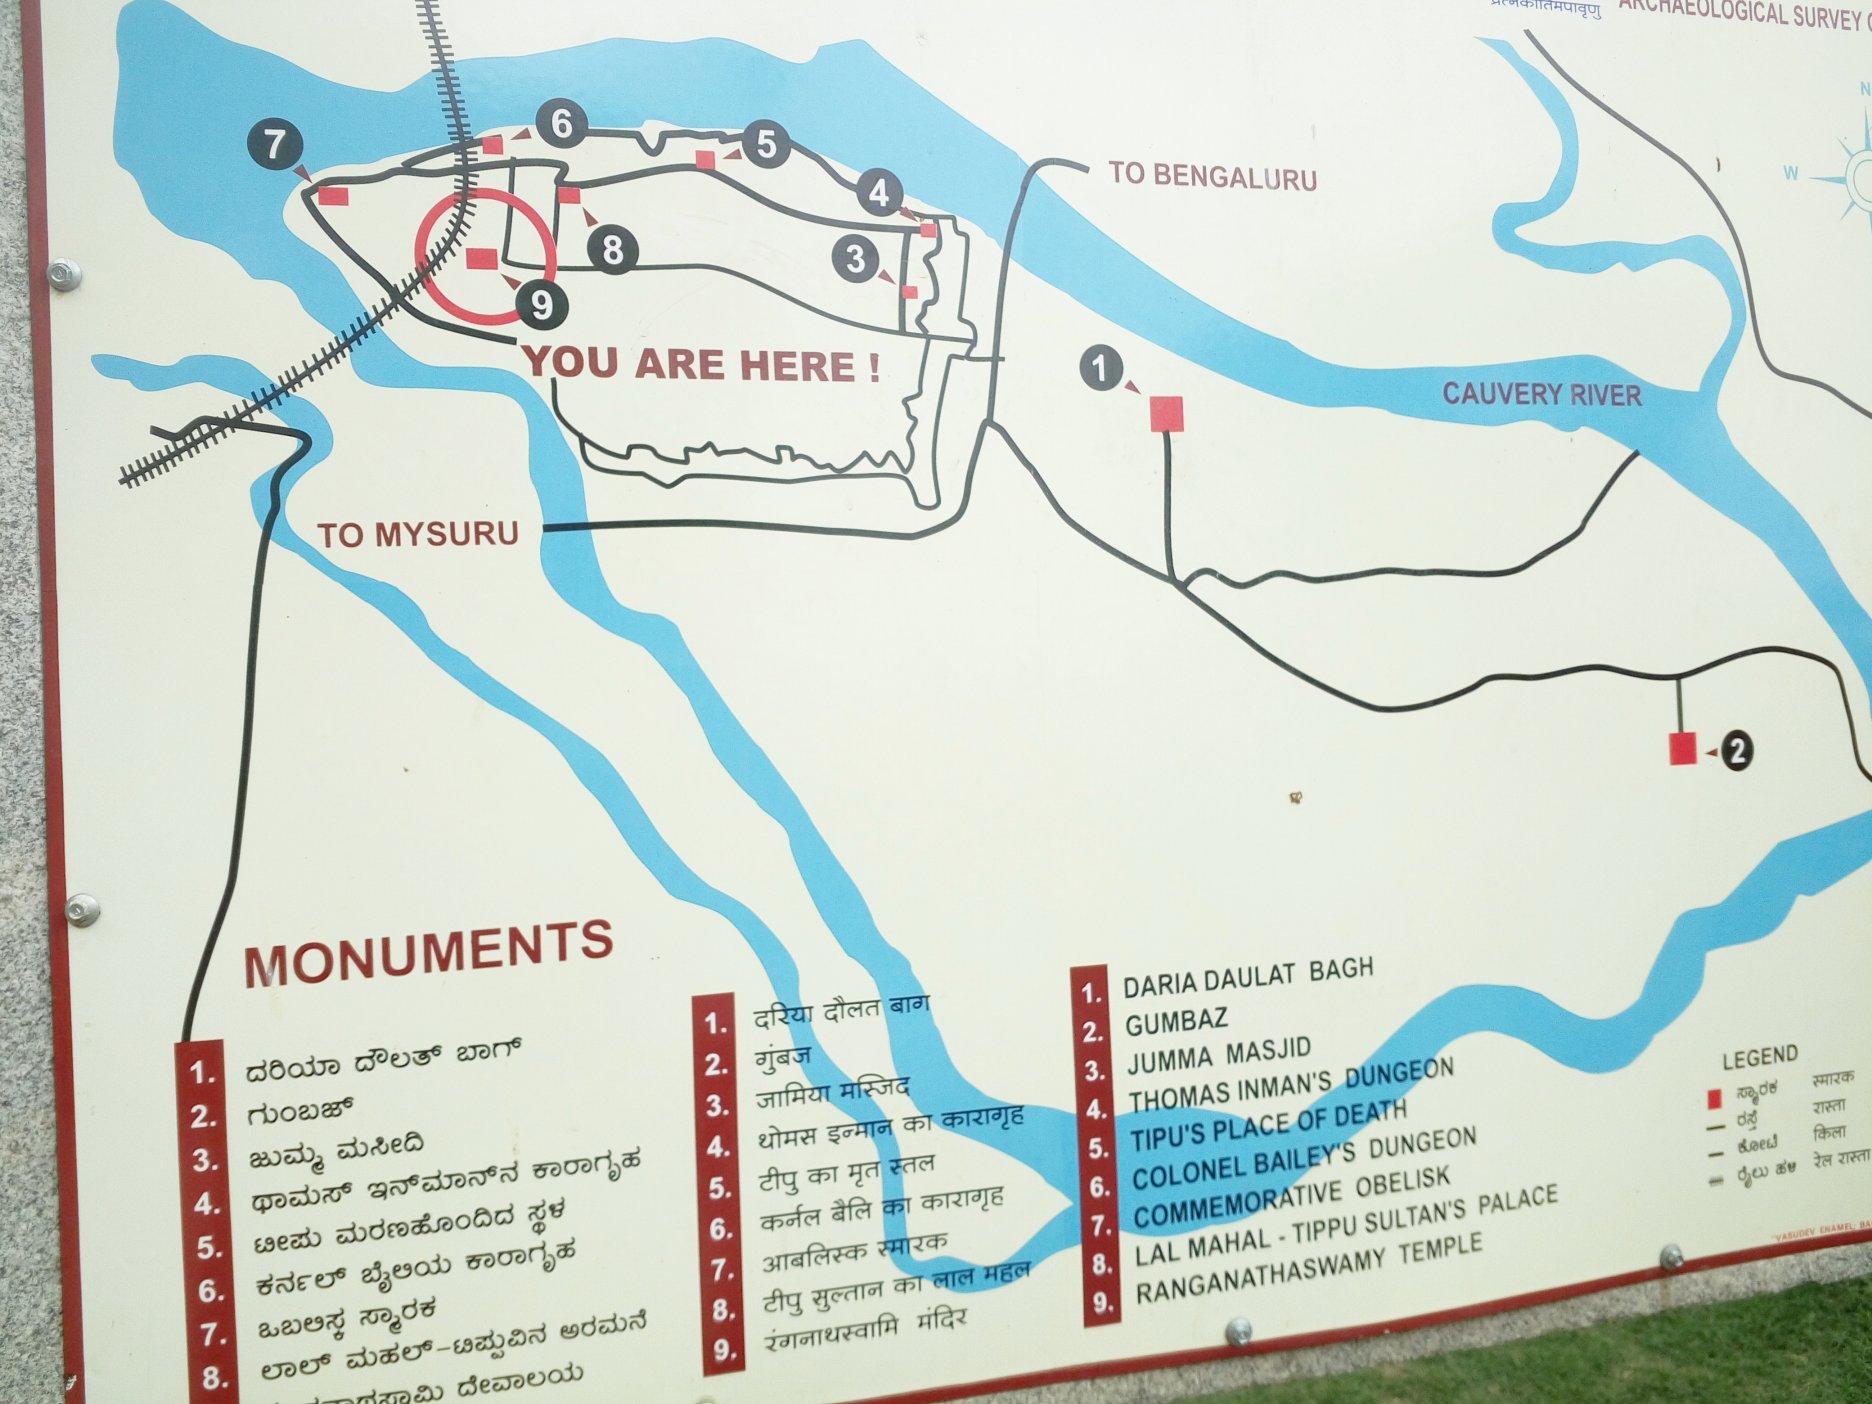 Map outside Ranganathaswamy Temple